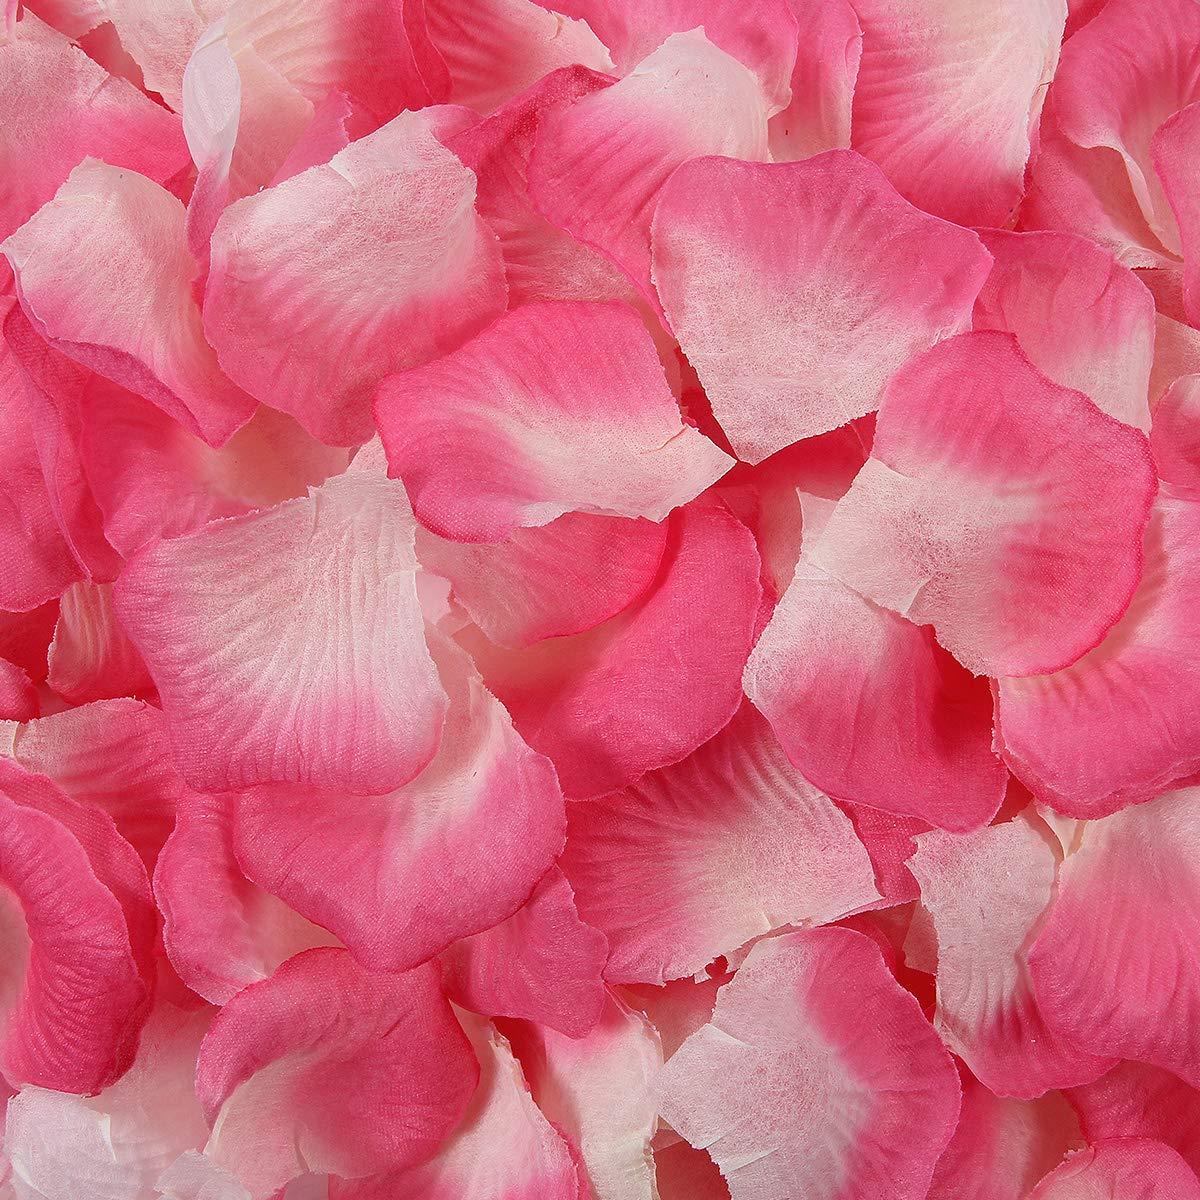 BESKIT 3000 Pcs Artificial Rose Petals Unscented Non-Woven Silk Flower Petals for Valentine Day Wedding Flower Decoration (Pink&white)